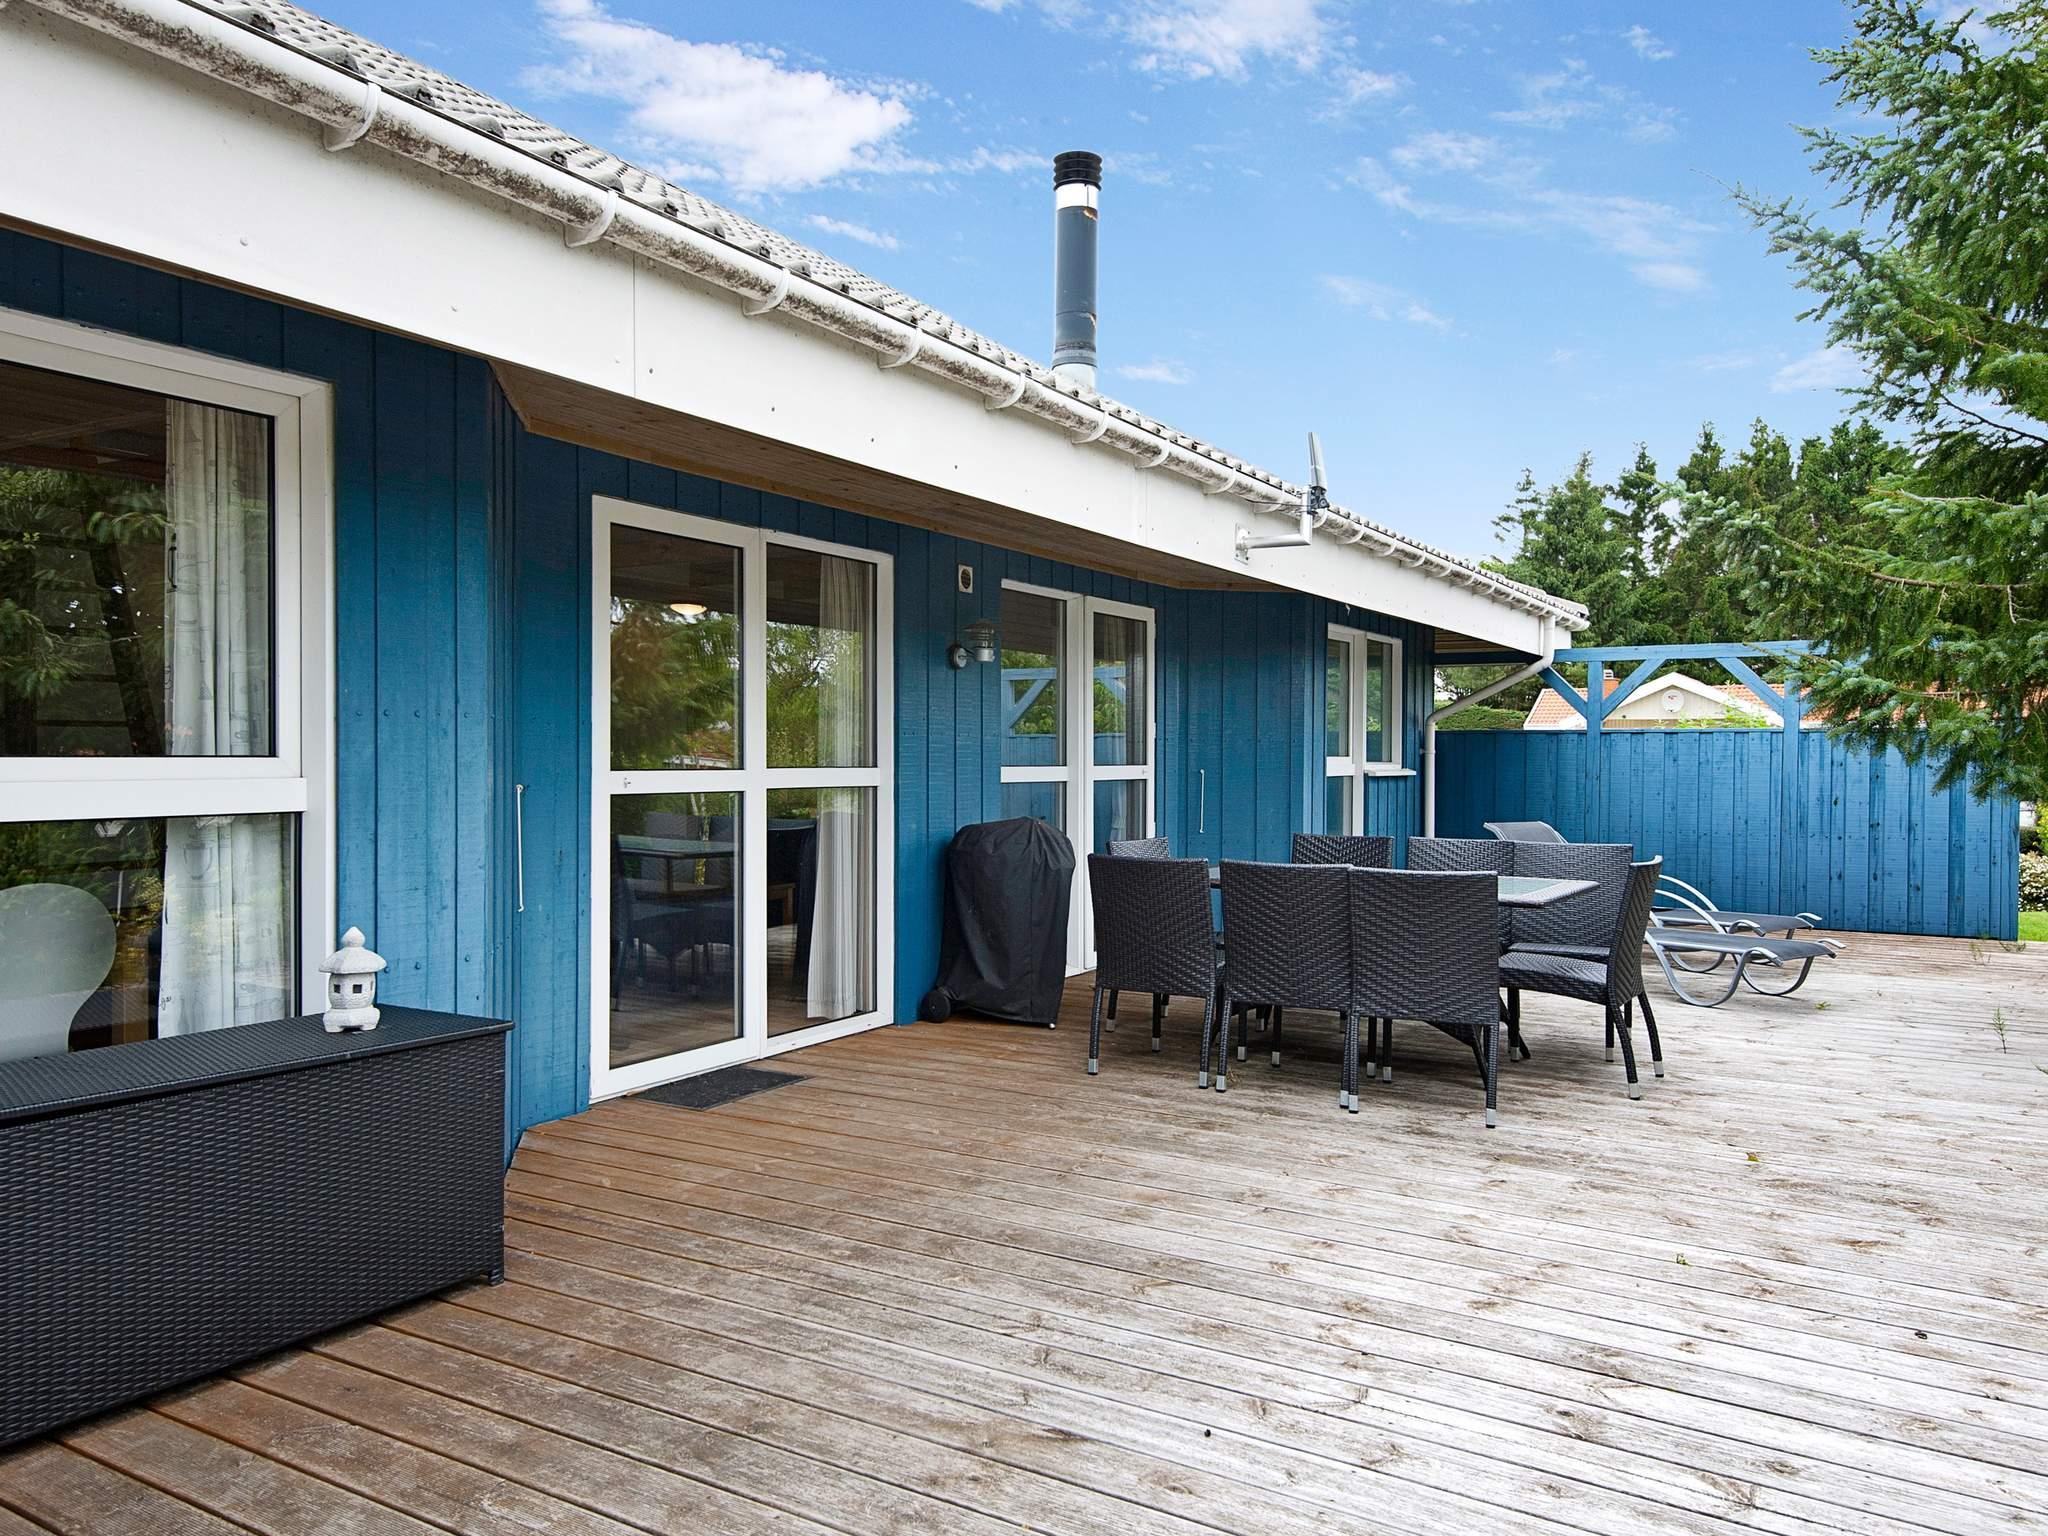 Ferienhaus Hejlsminde Strand (85687), Hejls, , Südostjütland, Dänemark, Bild 17